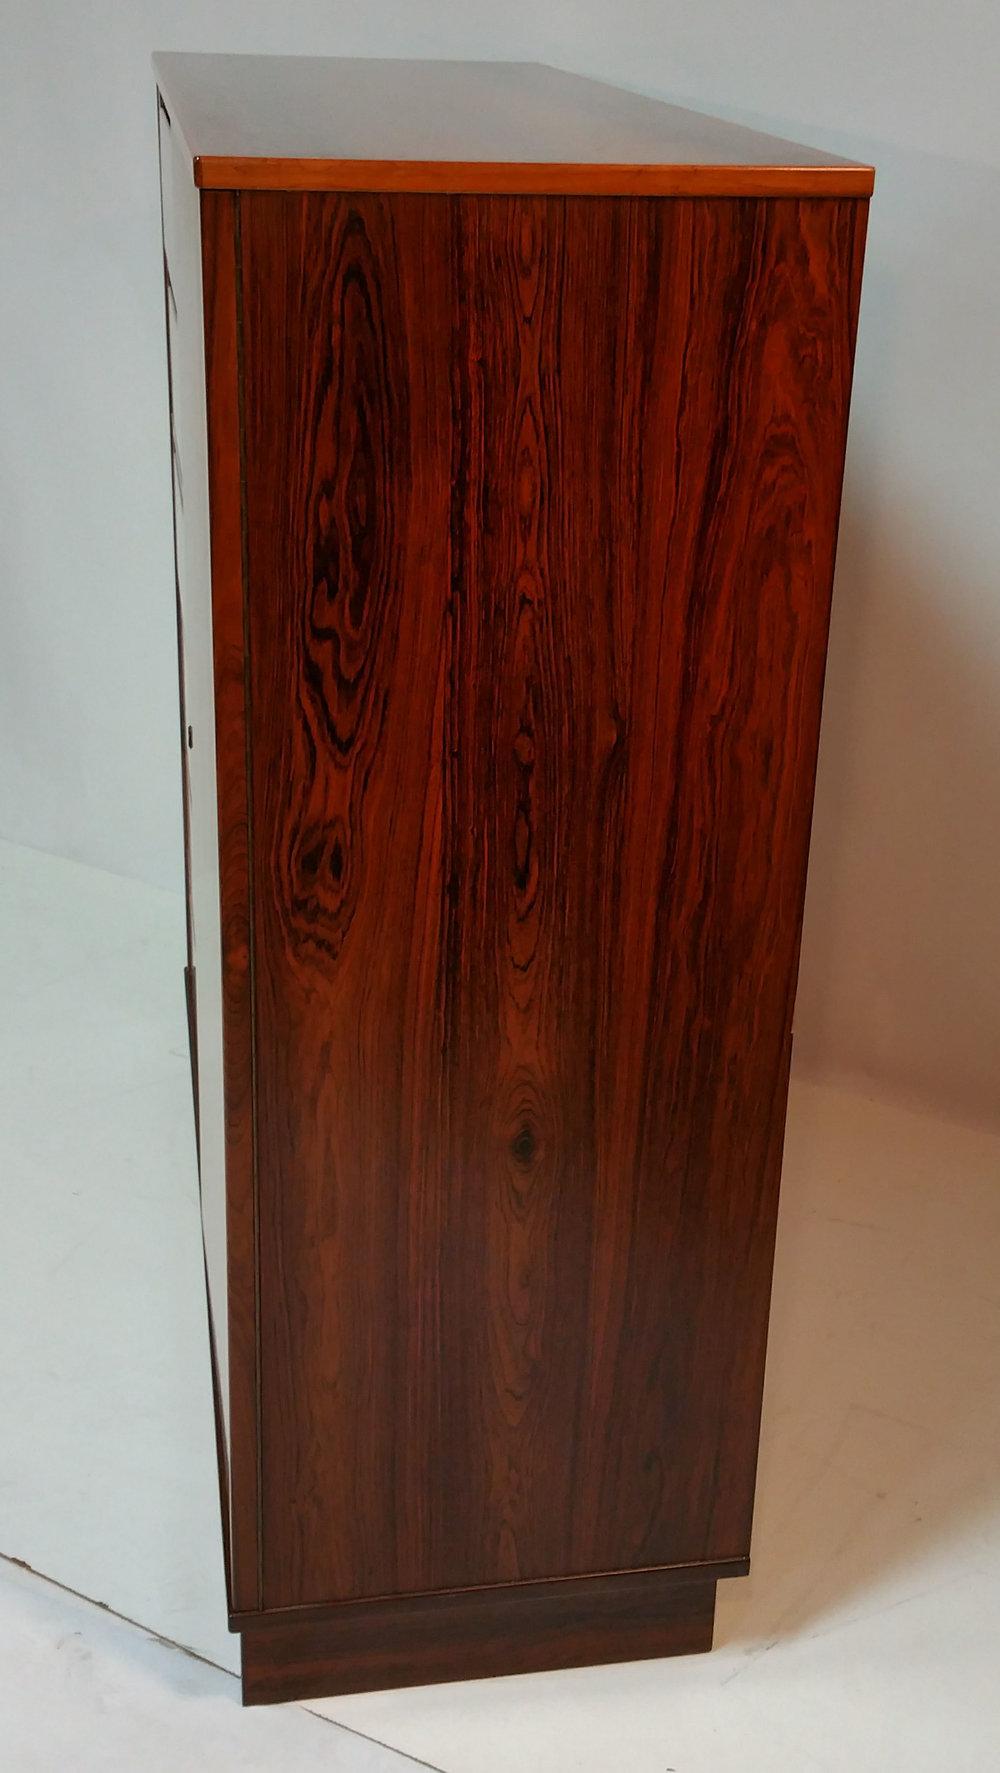 Rosewood dresser2_edited-1.jpg